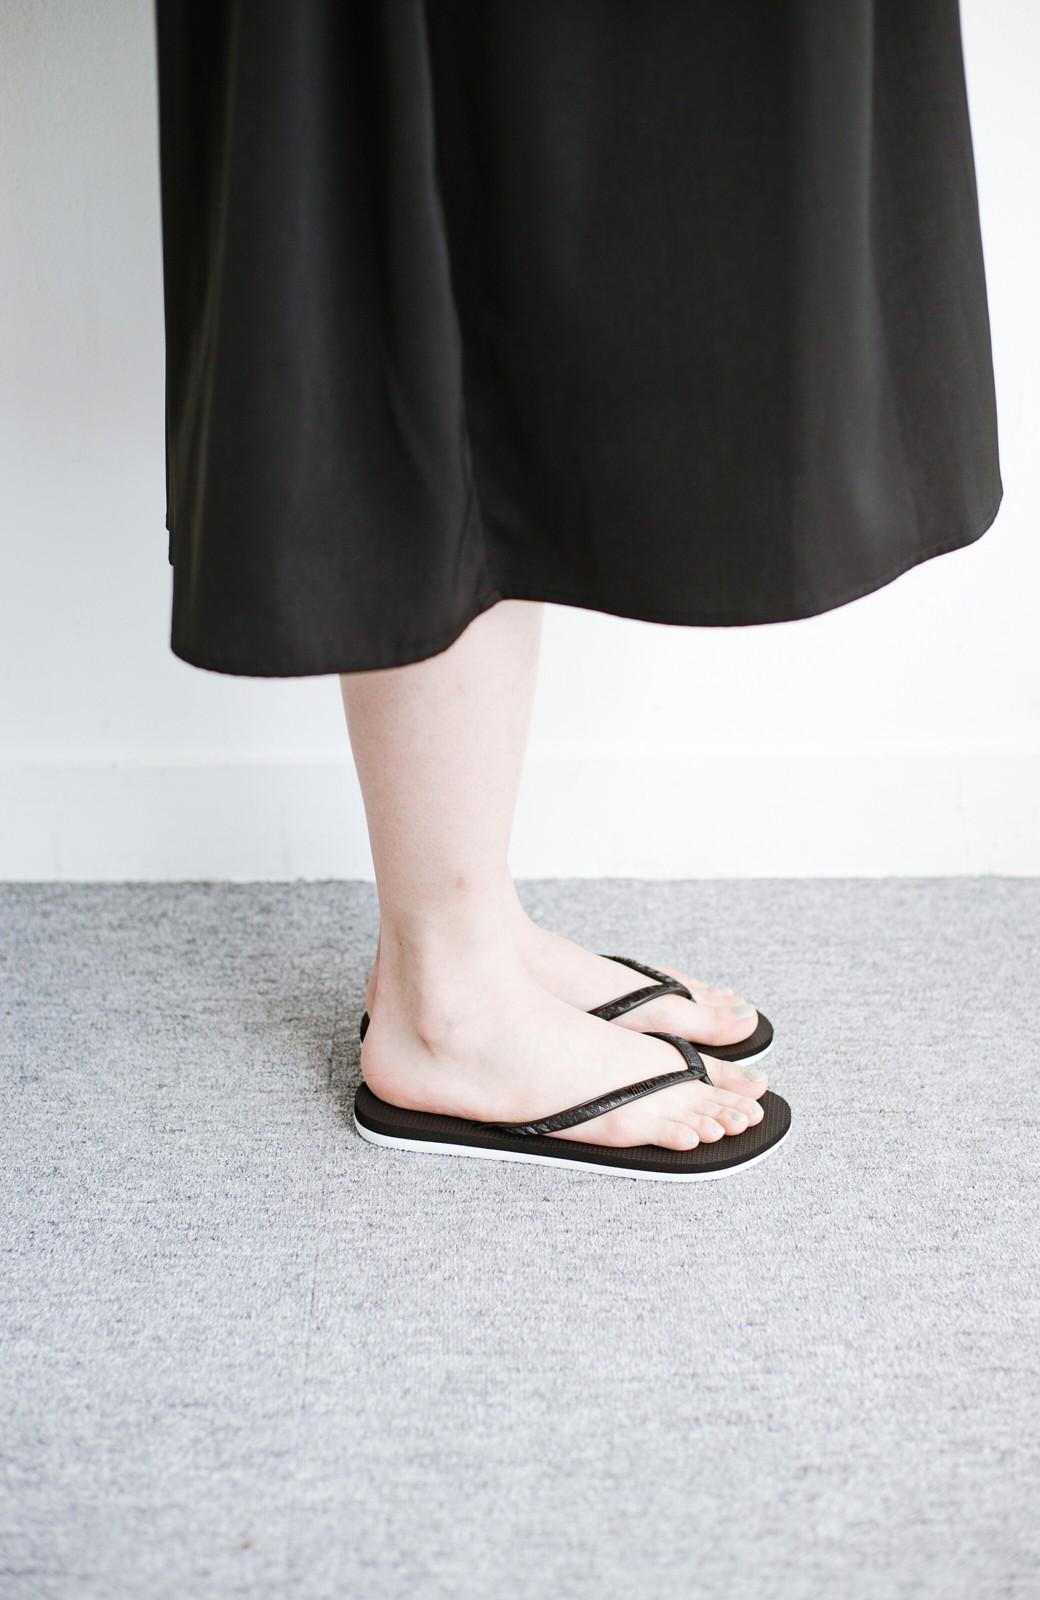 haco! 気軽に履きたい 天然ゴムのビーチサンダル byHAYN <ブラック>の商品写真4